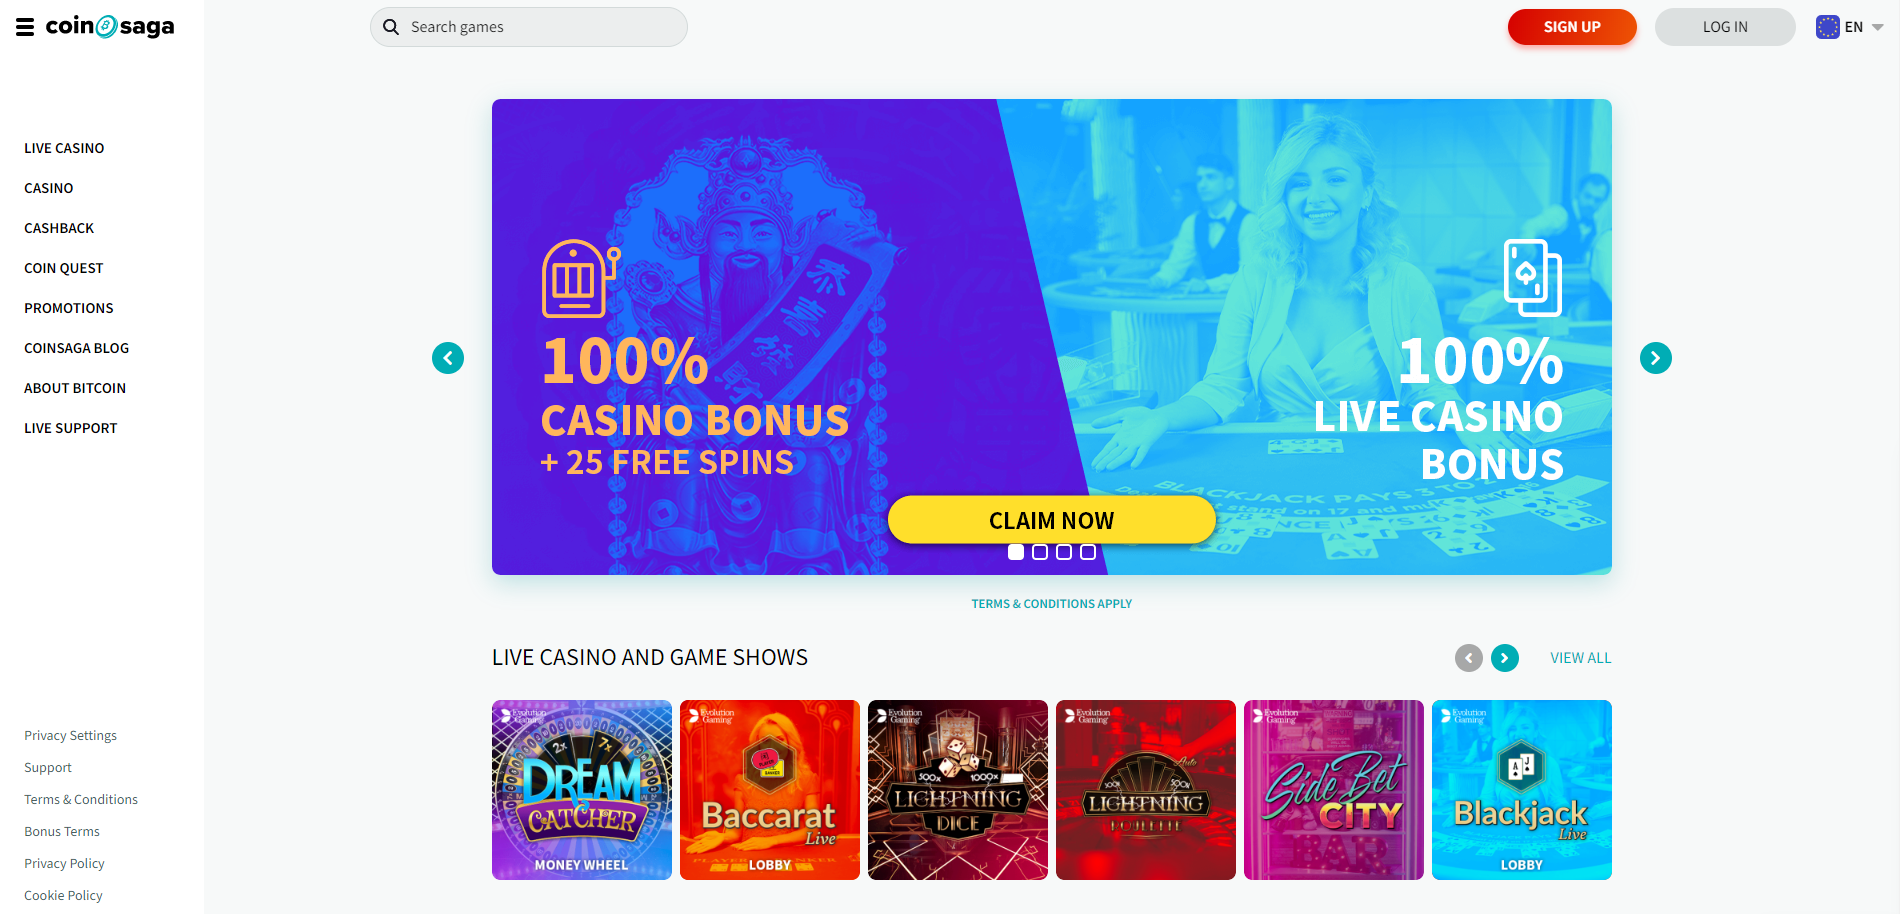 CoinSaga.com – A New Bitcoin Casino